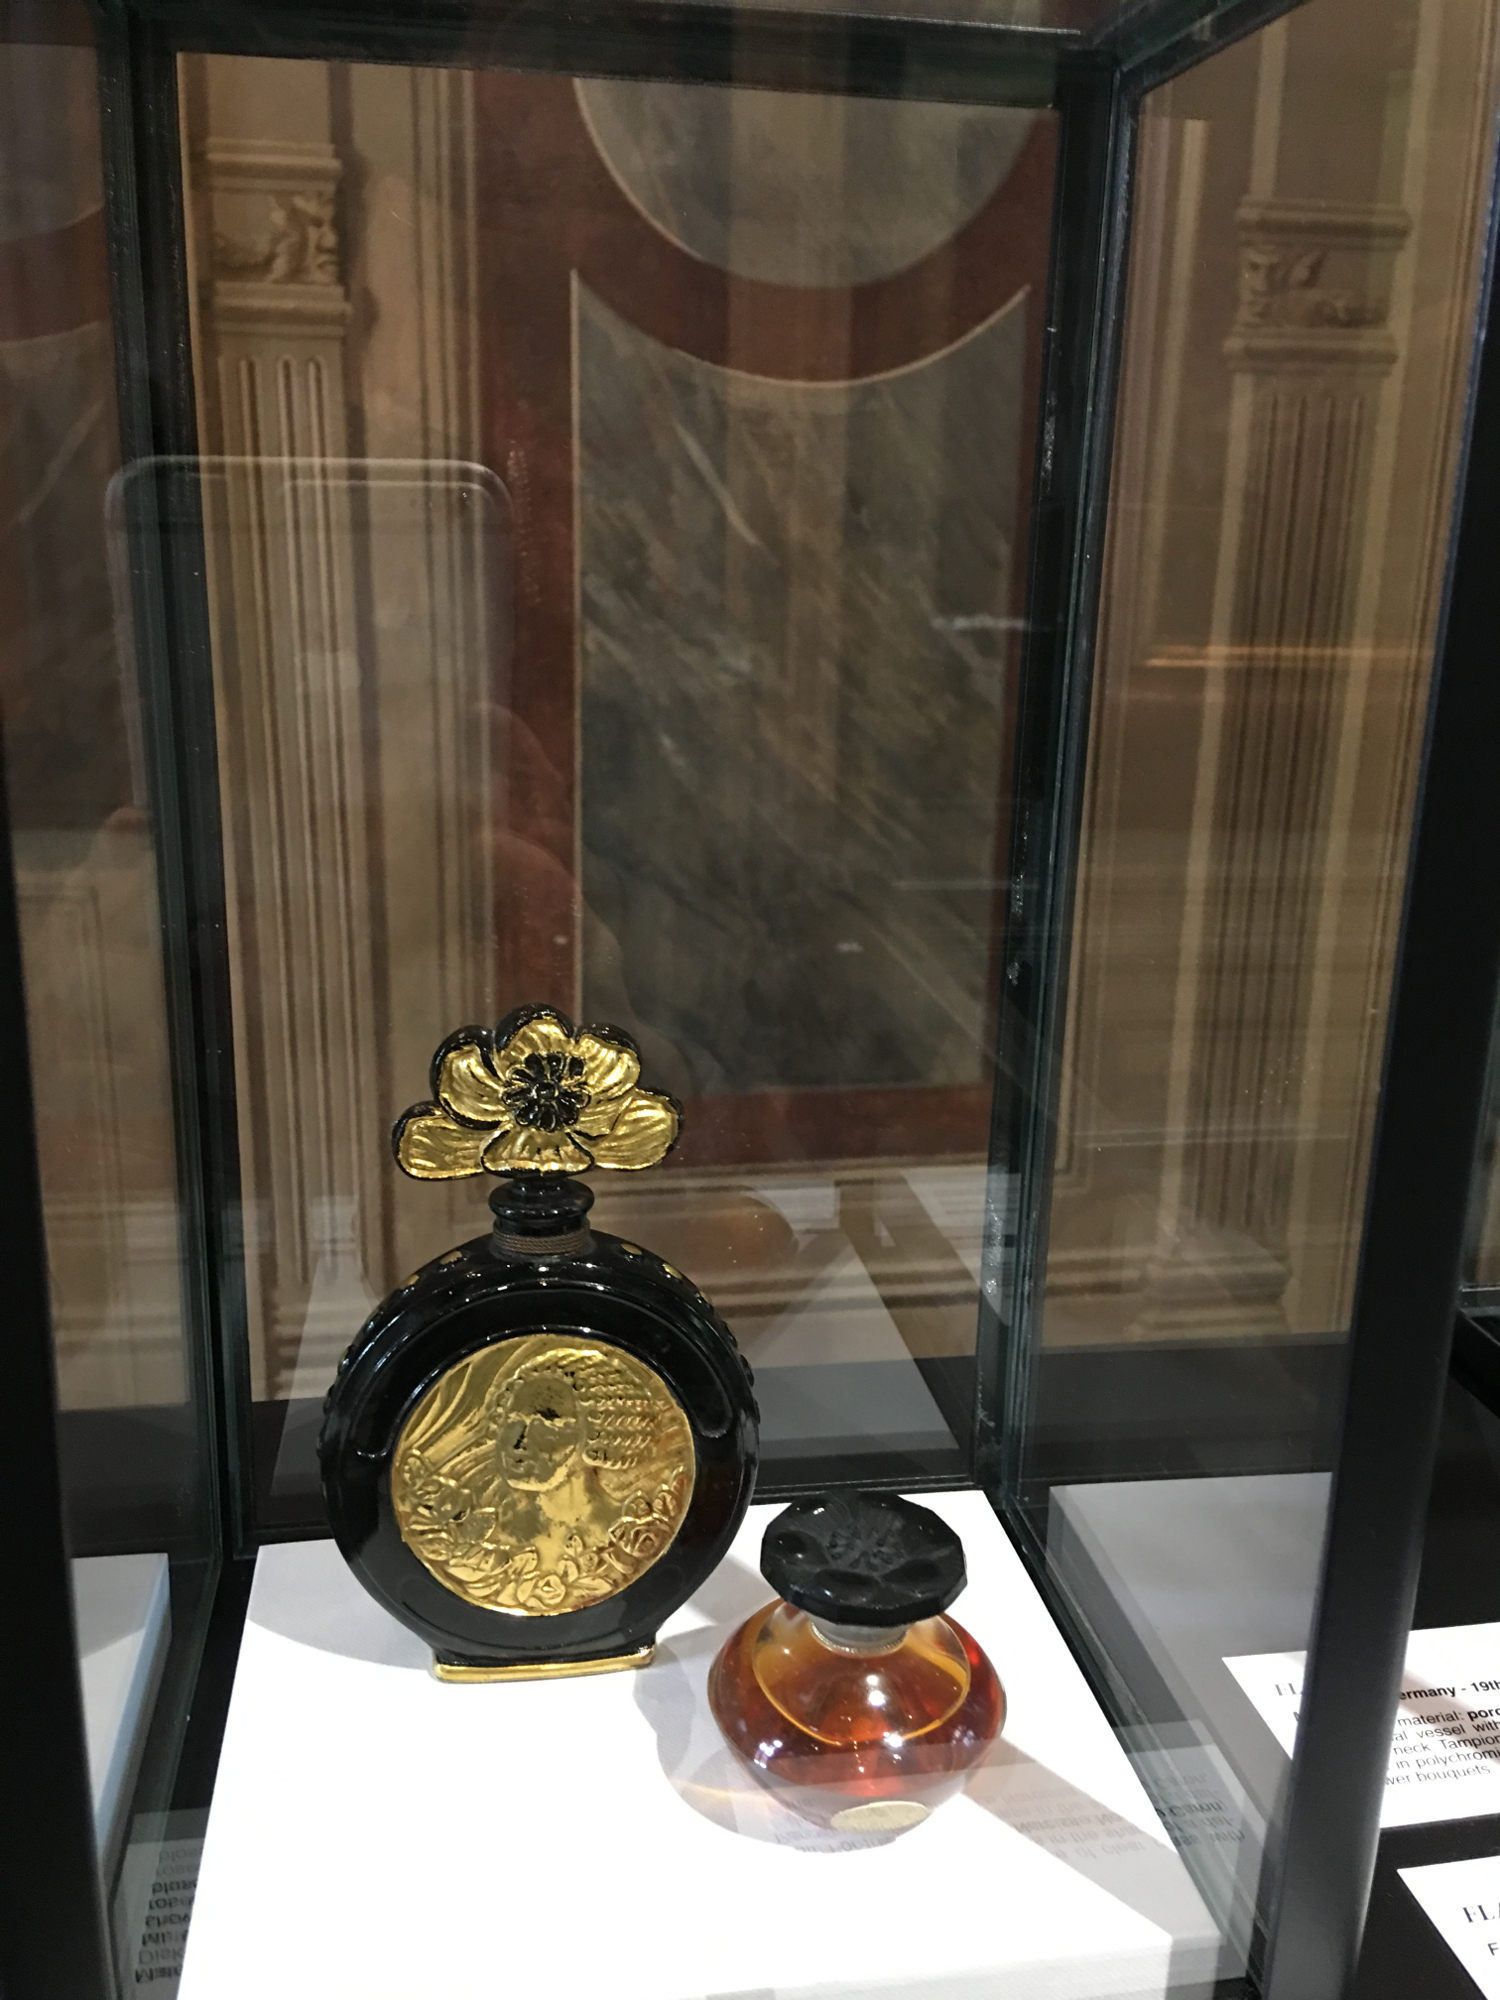 rocaille-blog-venezia-palazzo-mocenigo-cabinet-of-curiosities-collezione-storp-profumo-26